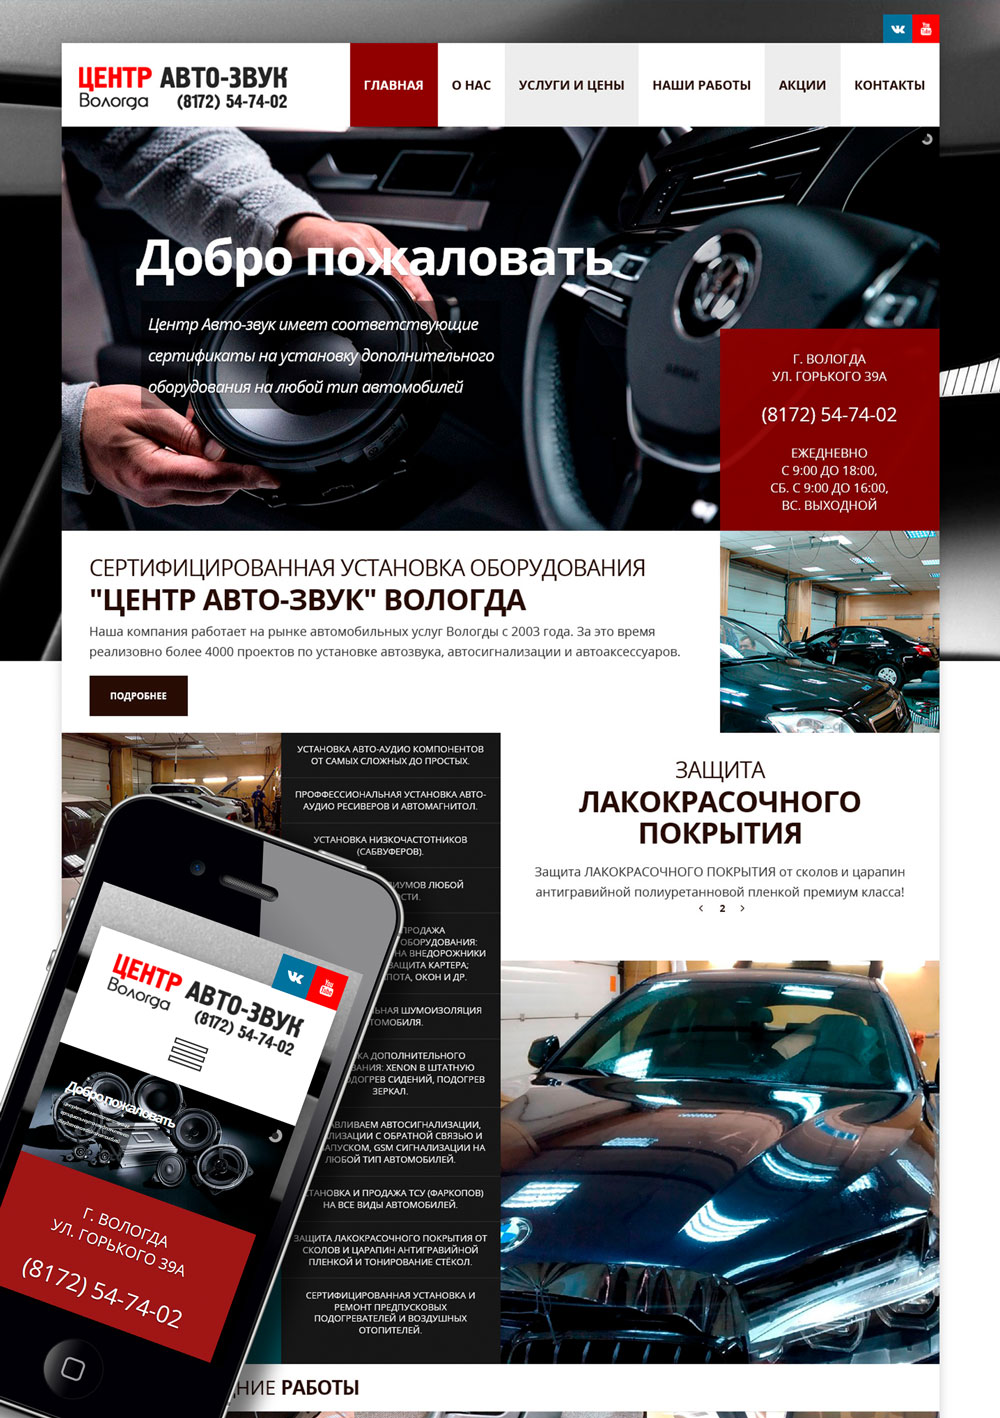 Центр Авто-звук Вологда